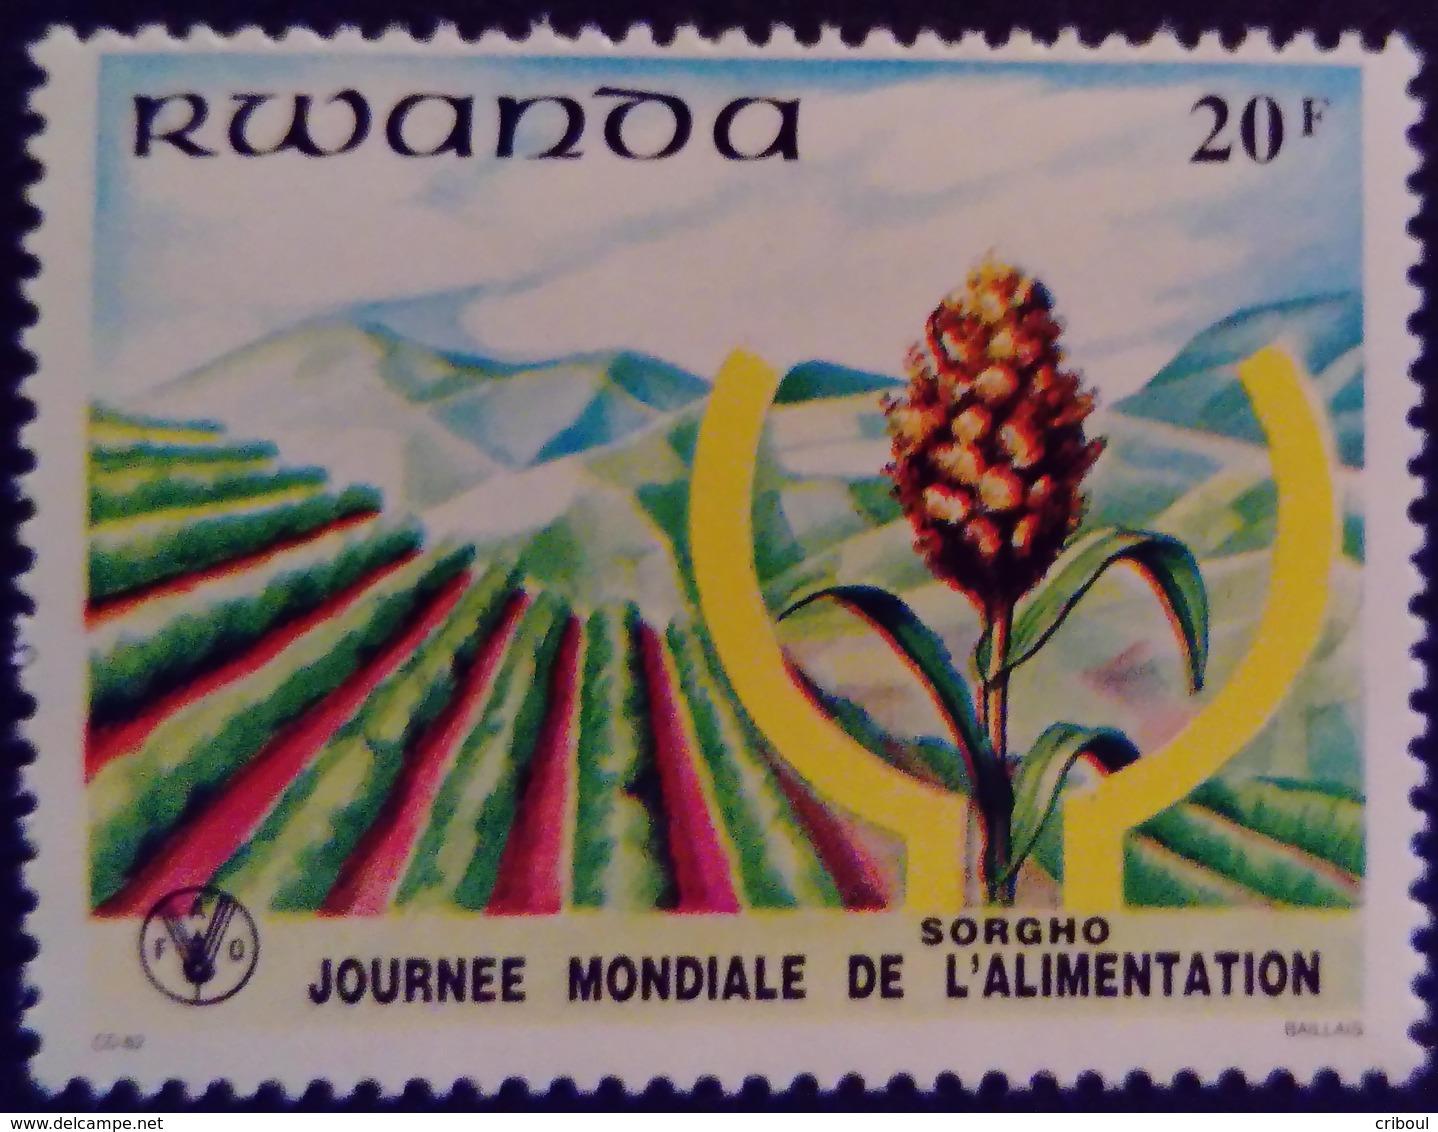 Rwanda 1982 Cereale Sorgho Alimentation Yvert 1044 ** MNH - Rwanda